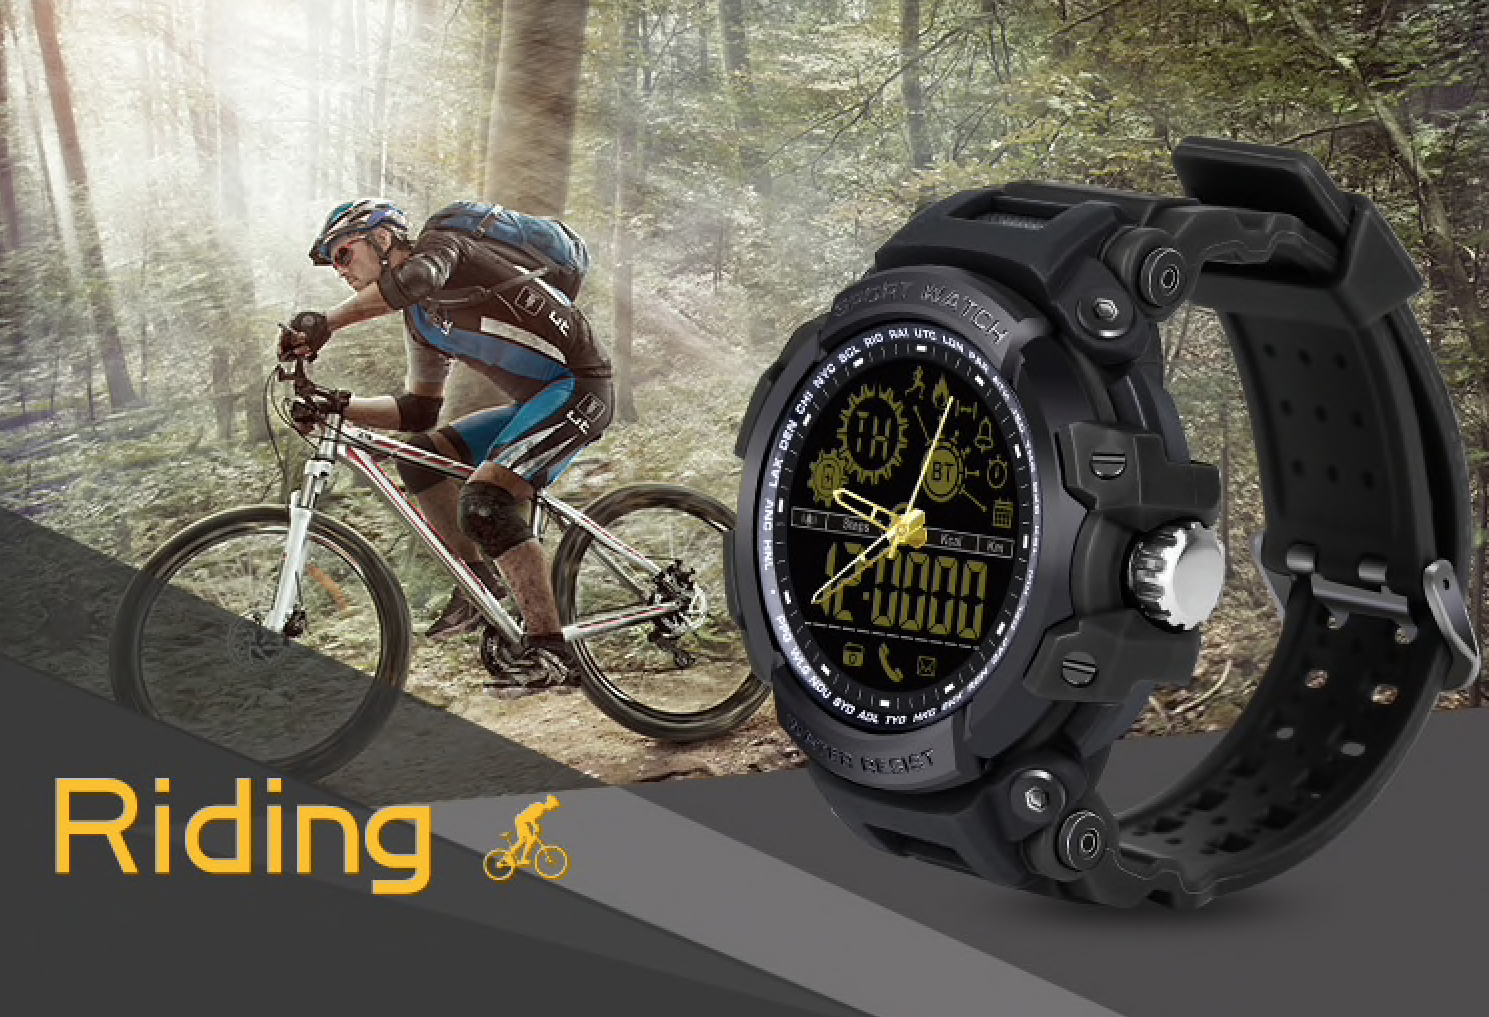 Nové chytré hodinky Diggro Dl10 za pouhých 440 Kč [sponzorovaný článek]